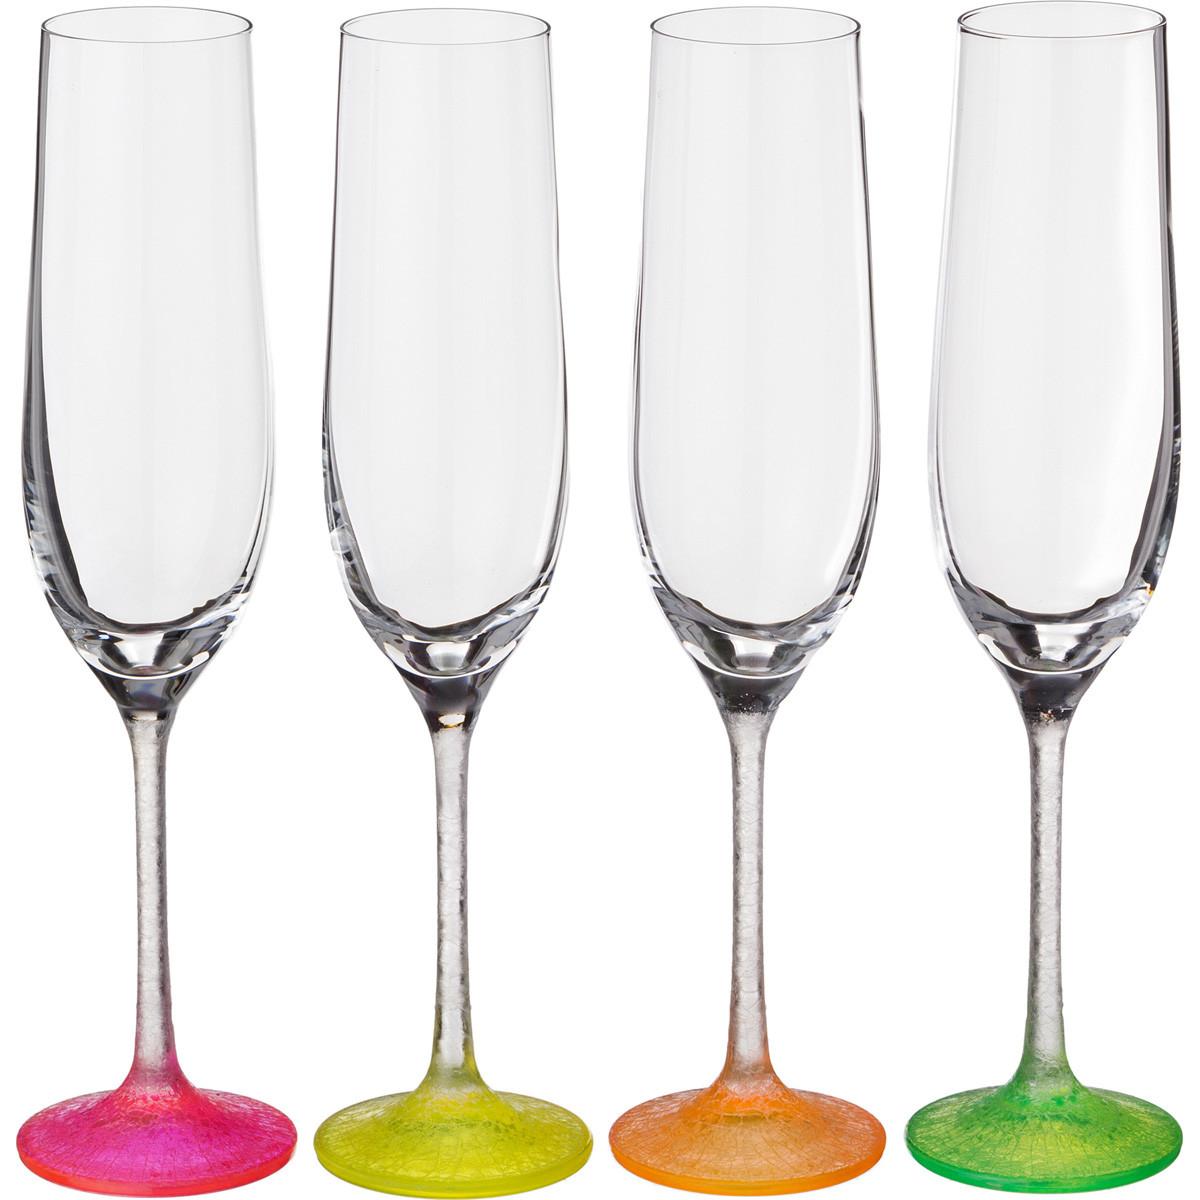 {} Bohemia Crystal Набор бокалов для шампанского Bambie  (24 см - 4 шт) crystal bohemia